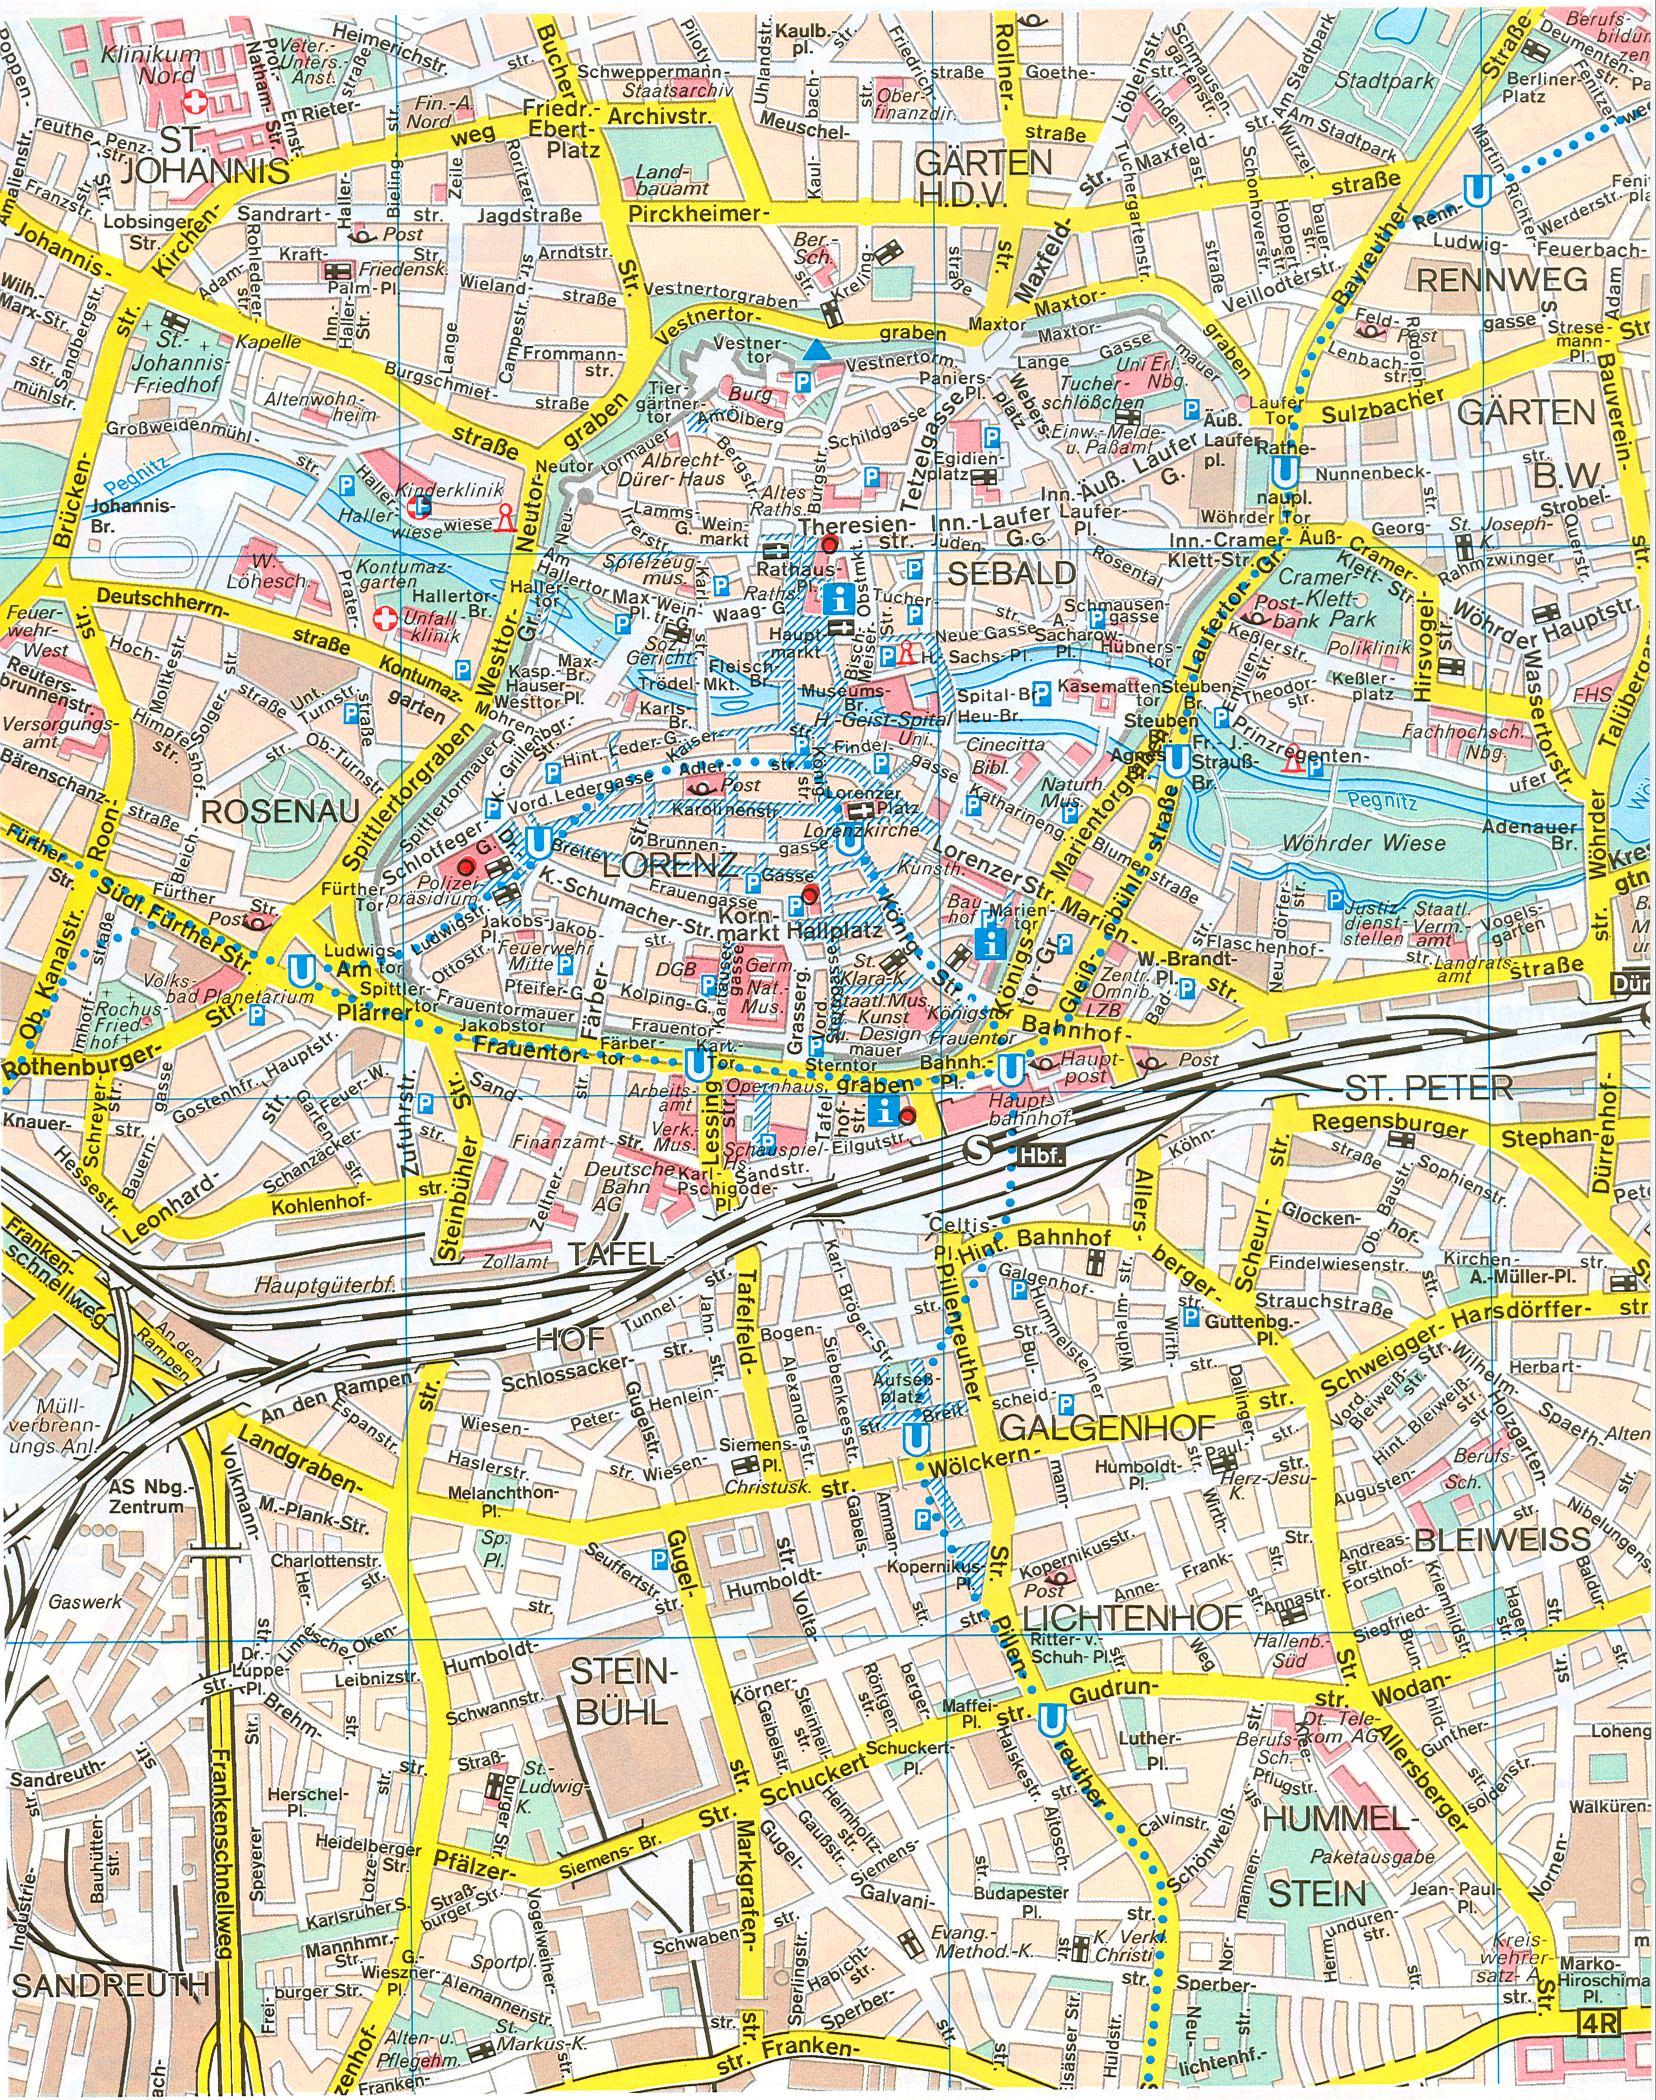 ... города Нюрнберг, карта масштаба 1см:120м: map-auto.ru/map320737_0_0.htm